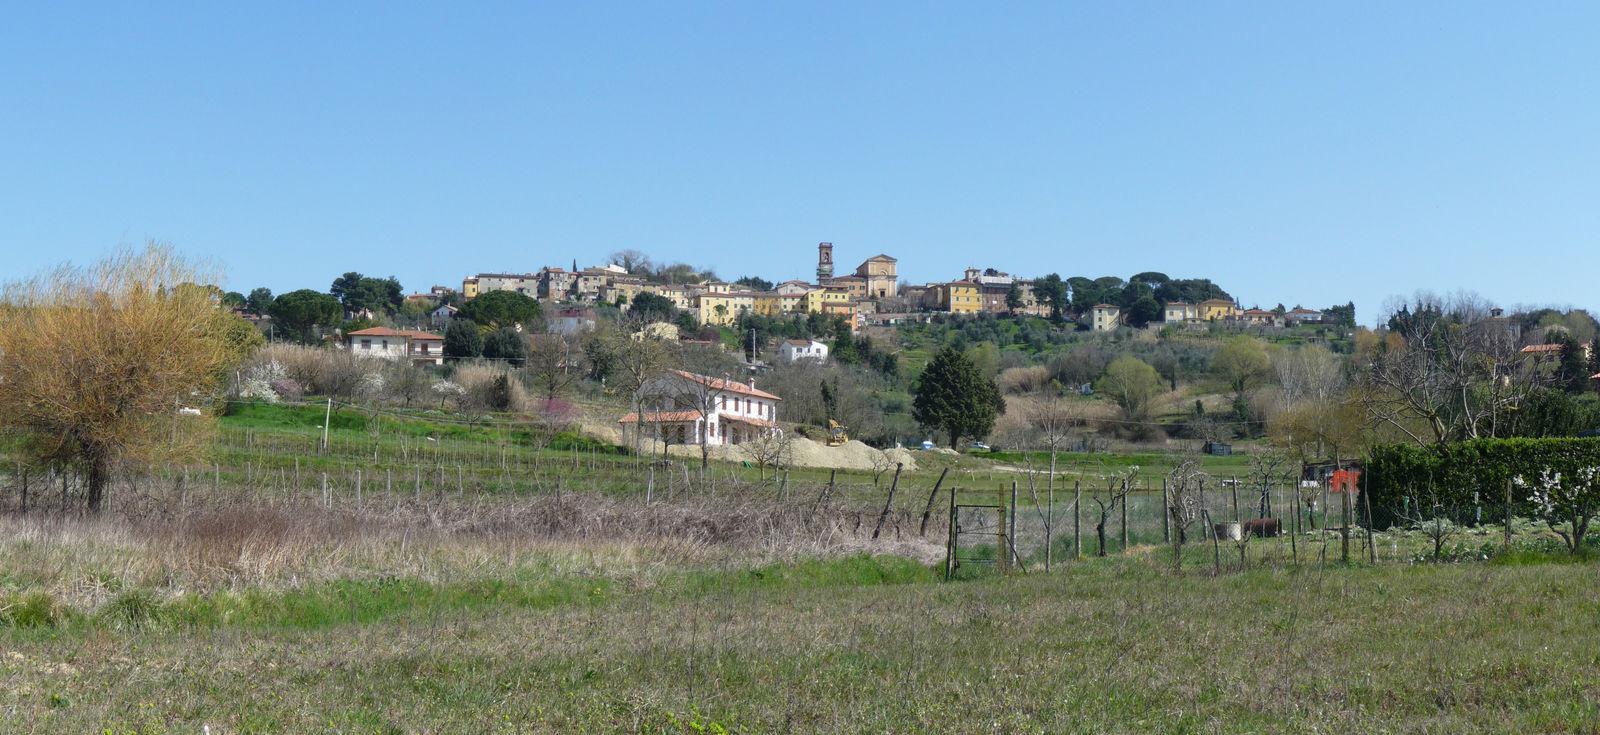 Crespina Lorenzana - In the heart of the Pisan hills